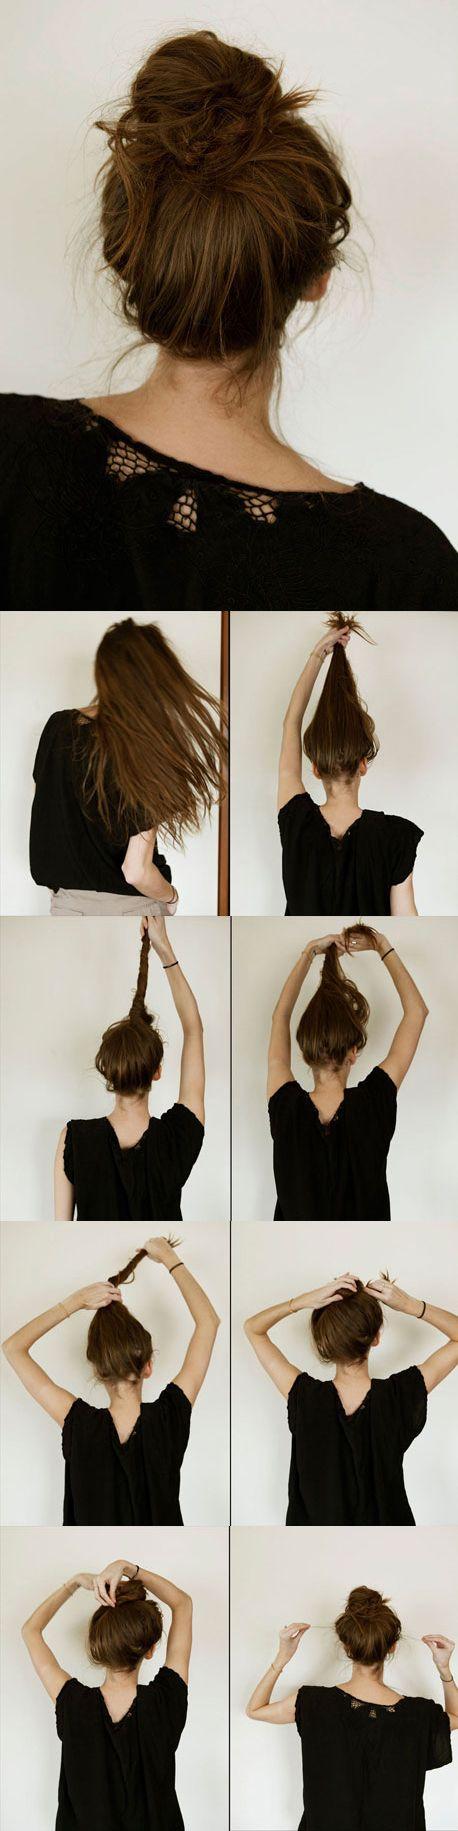 Groovy 1000 Ideas About Perfect Messy Bun On Pinterest Messy Buns Short Hairstyles Gunalazisus